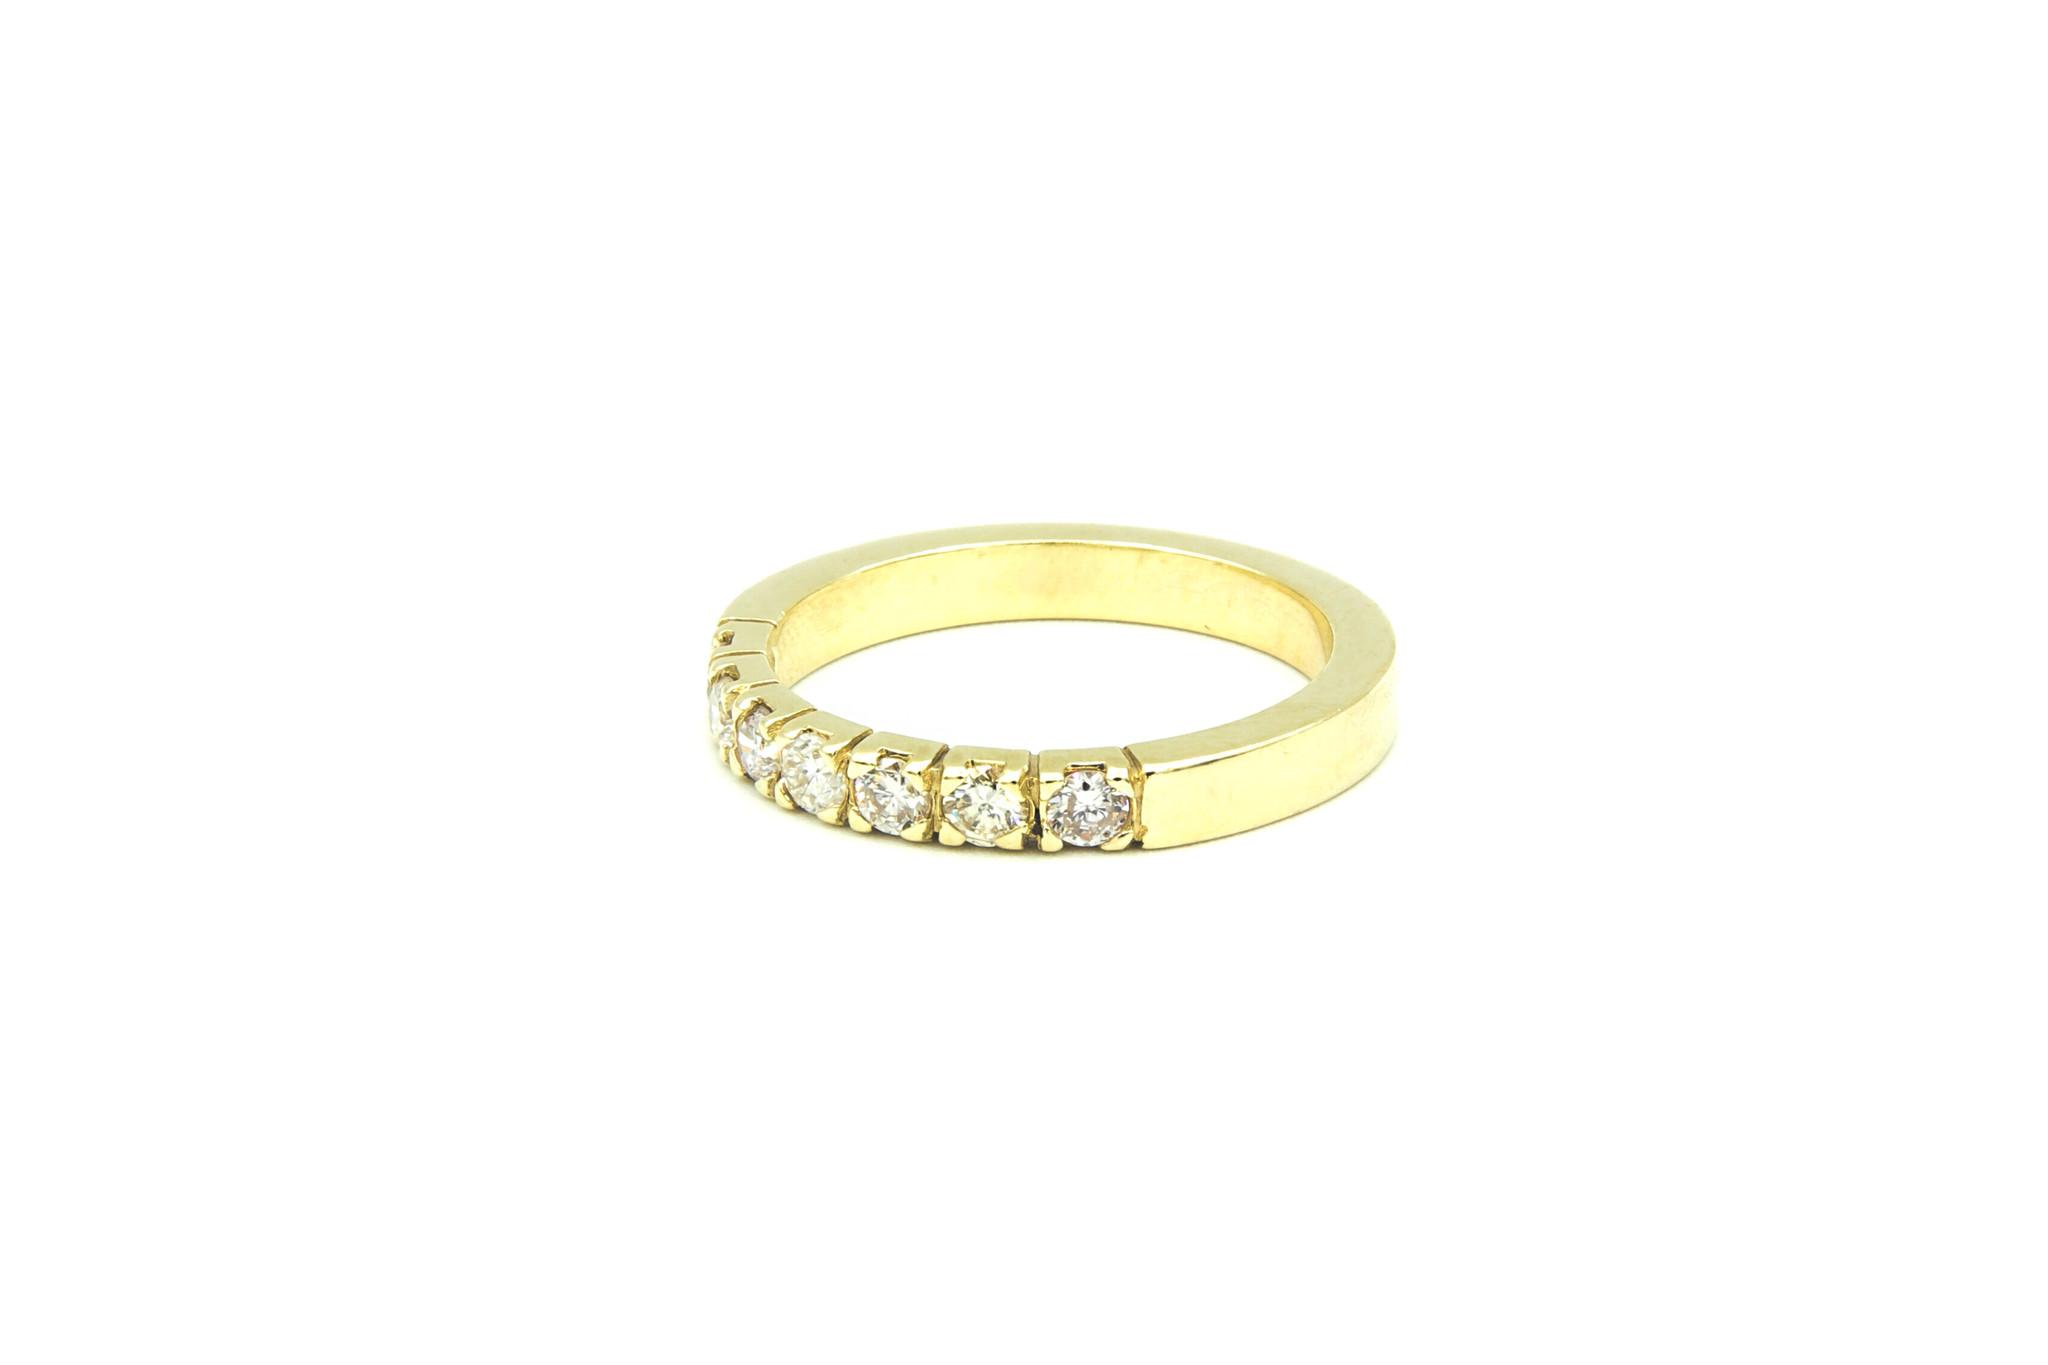 Ring verlovingsring klassiek met 7 diamanten ingezet-2